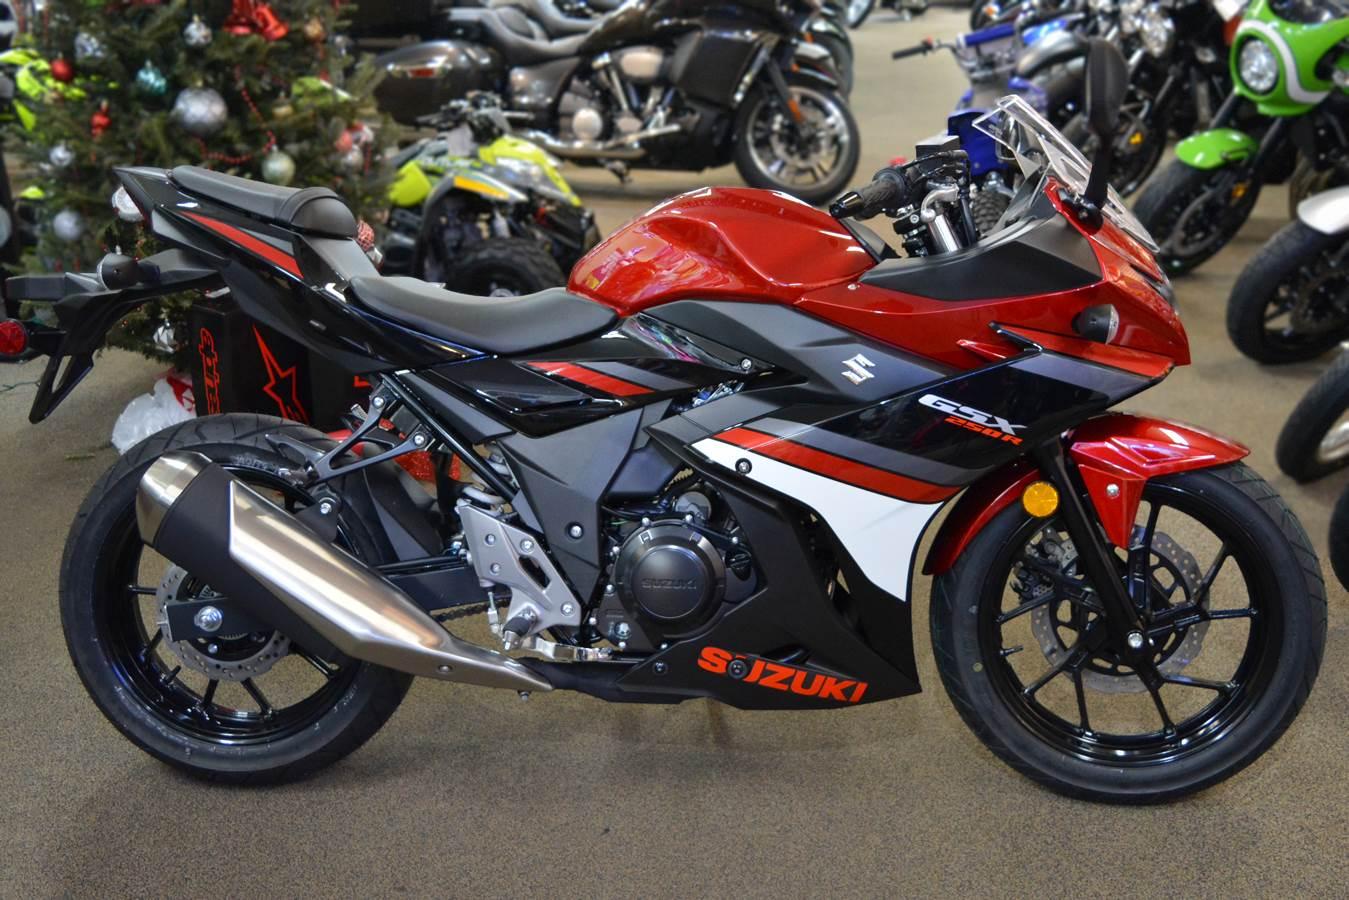 New 2019 Suzuki Gsx250r Motorcycles In Clearwater Fl Stock Number